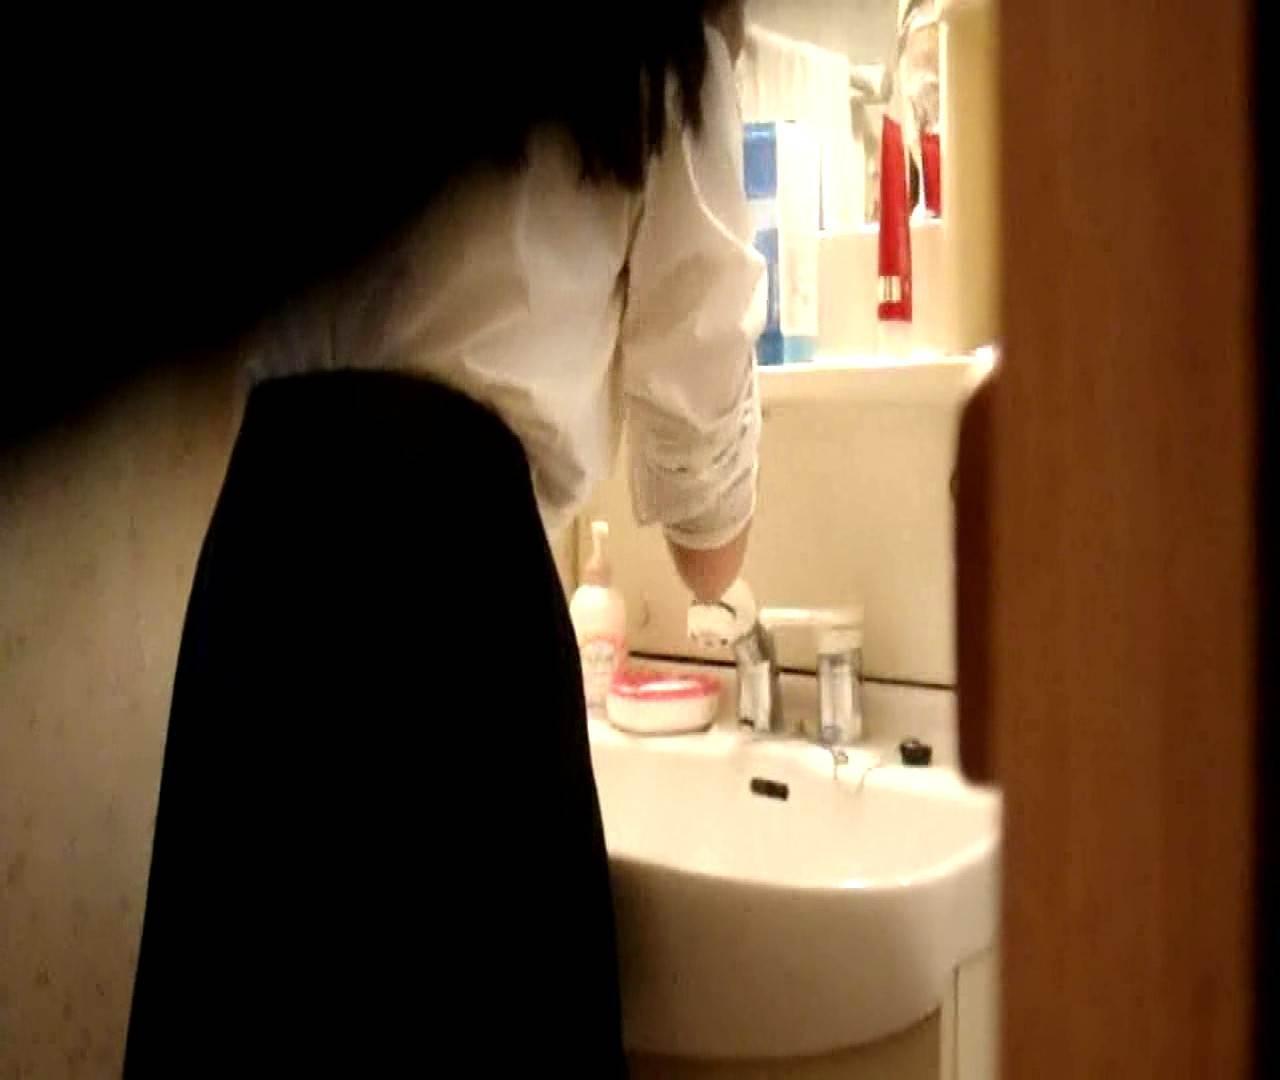 vol.5 まどかが帰宅後の洗顔後にブラを洗ってます。 ギャル達 | 民家  112枚 53